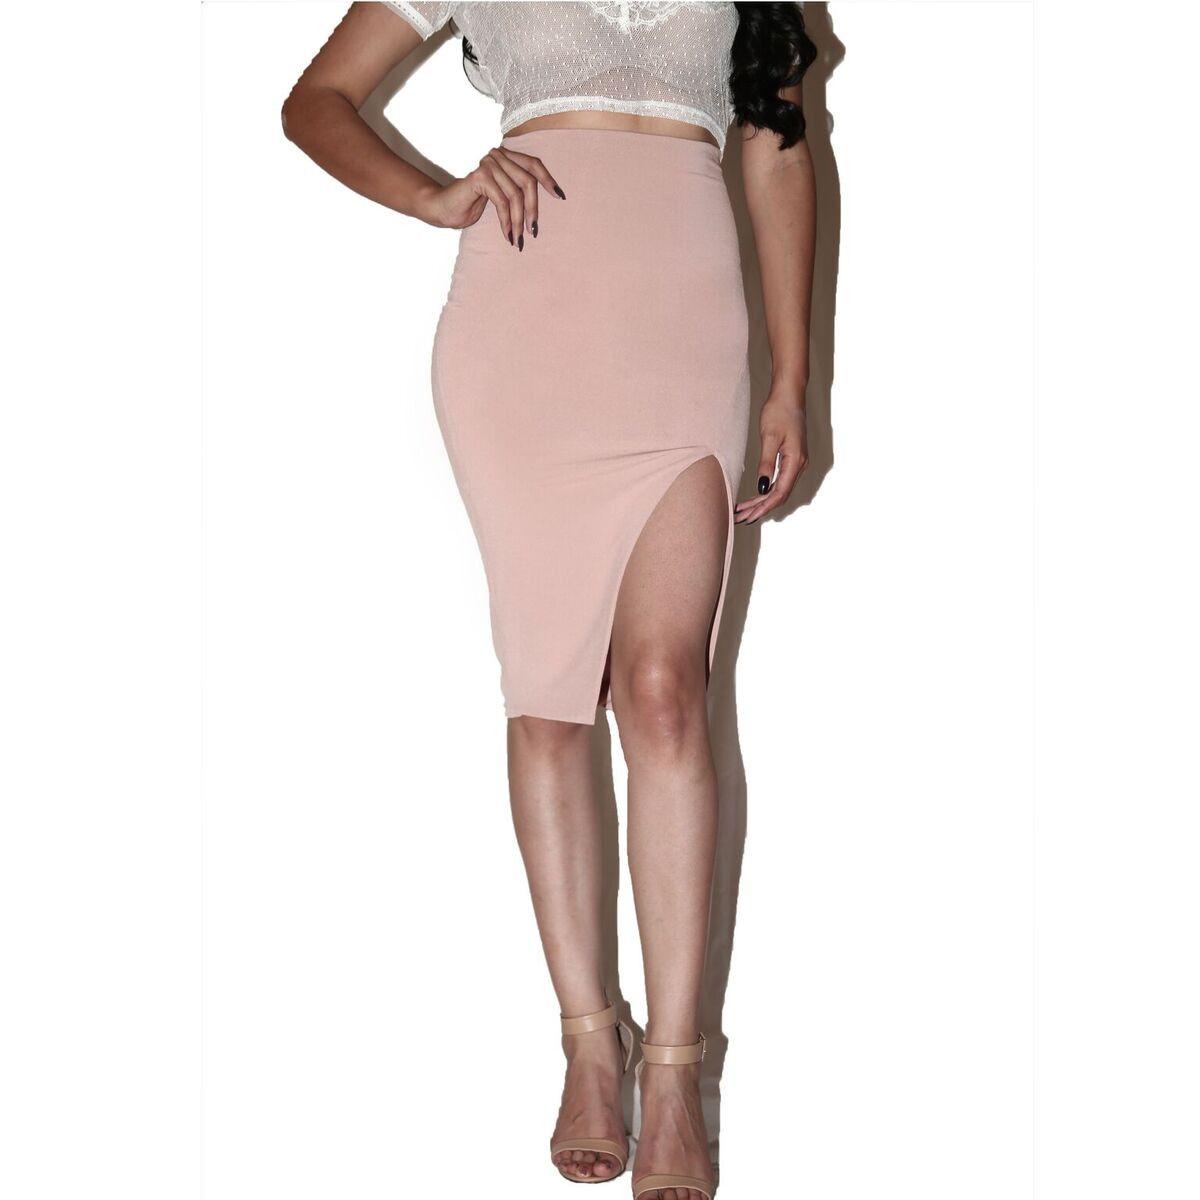 Nori blush skirt products pinterest blush skirt and products